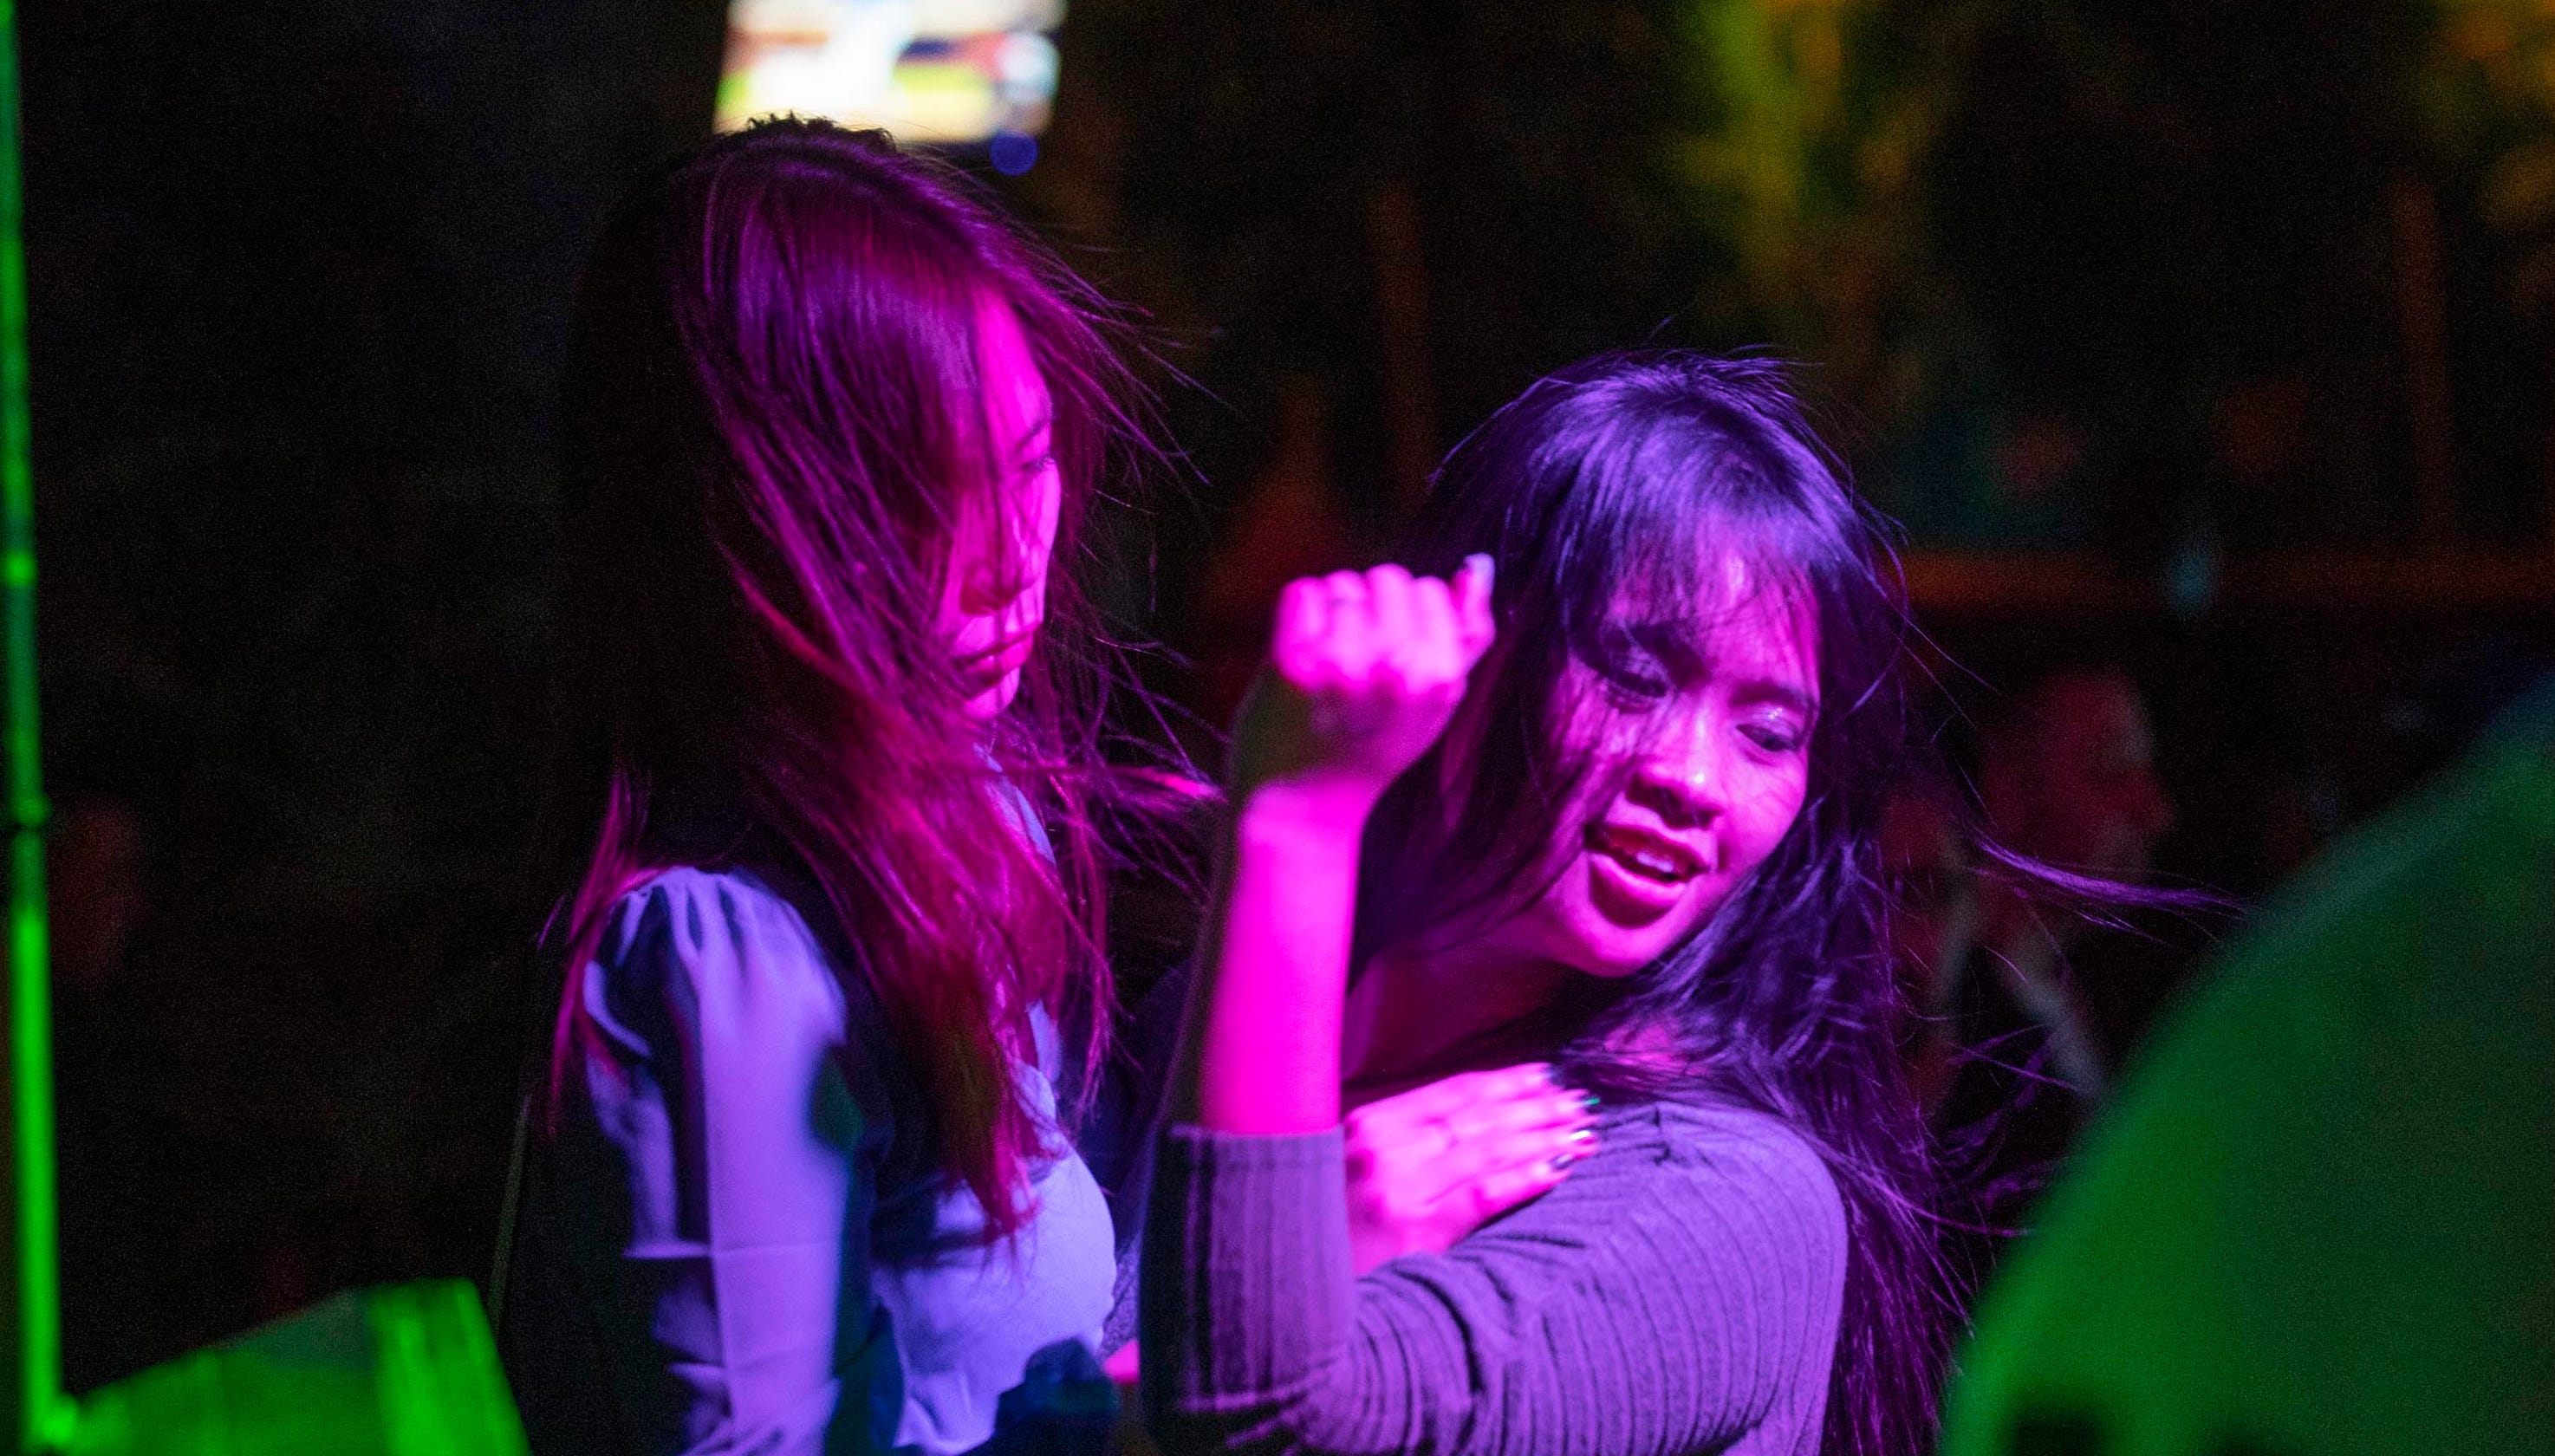 Bamboo Bar Seaside: Brawls, wet T-shirts, lawsuits at MTV